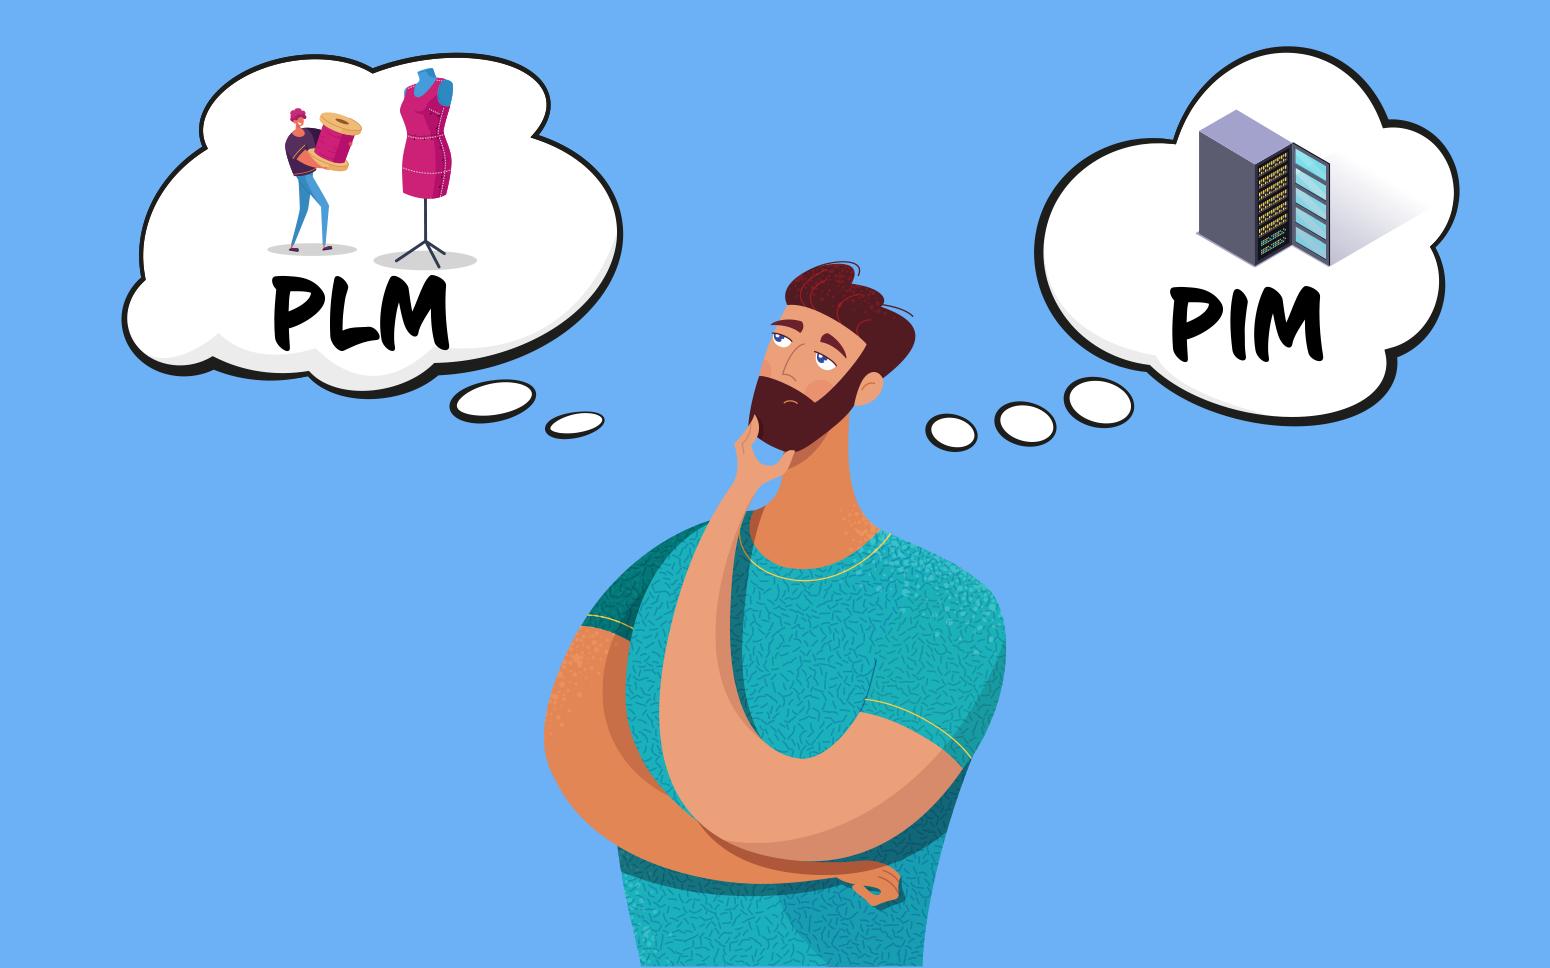 PLM Software vs PIM Software